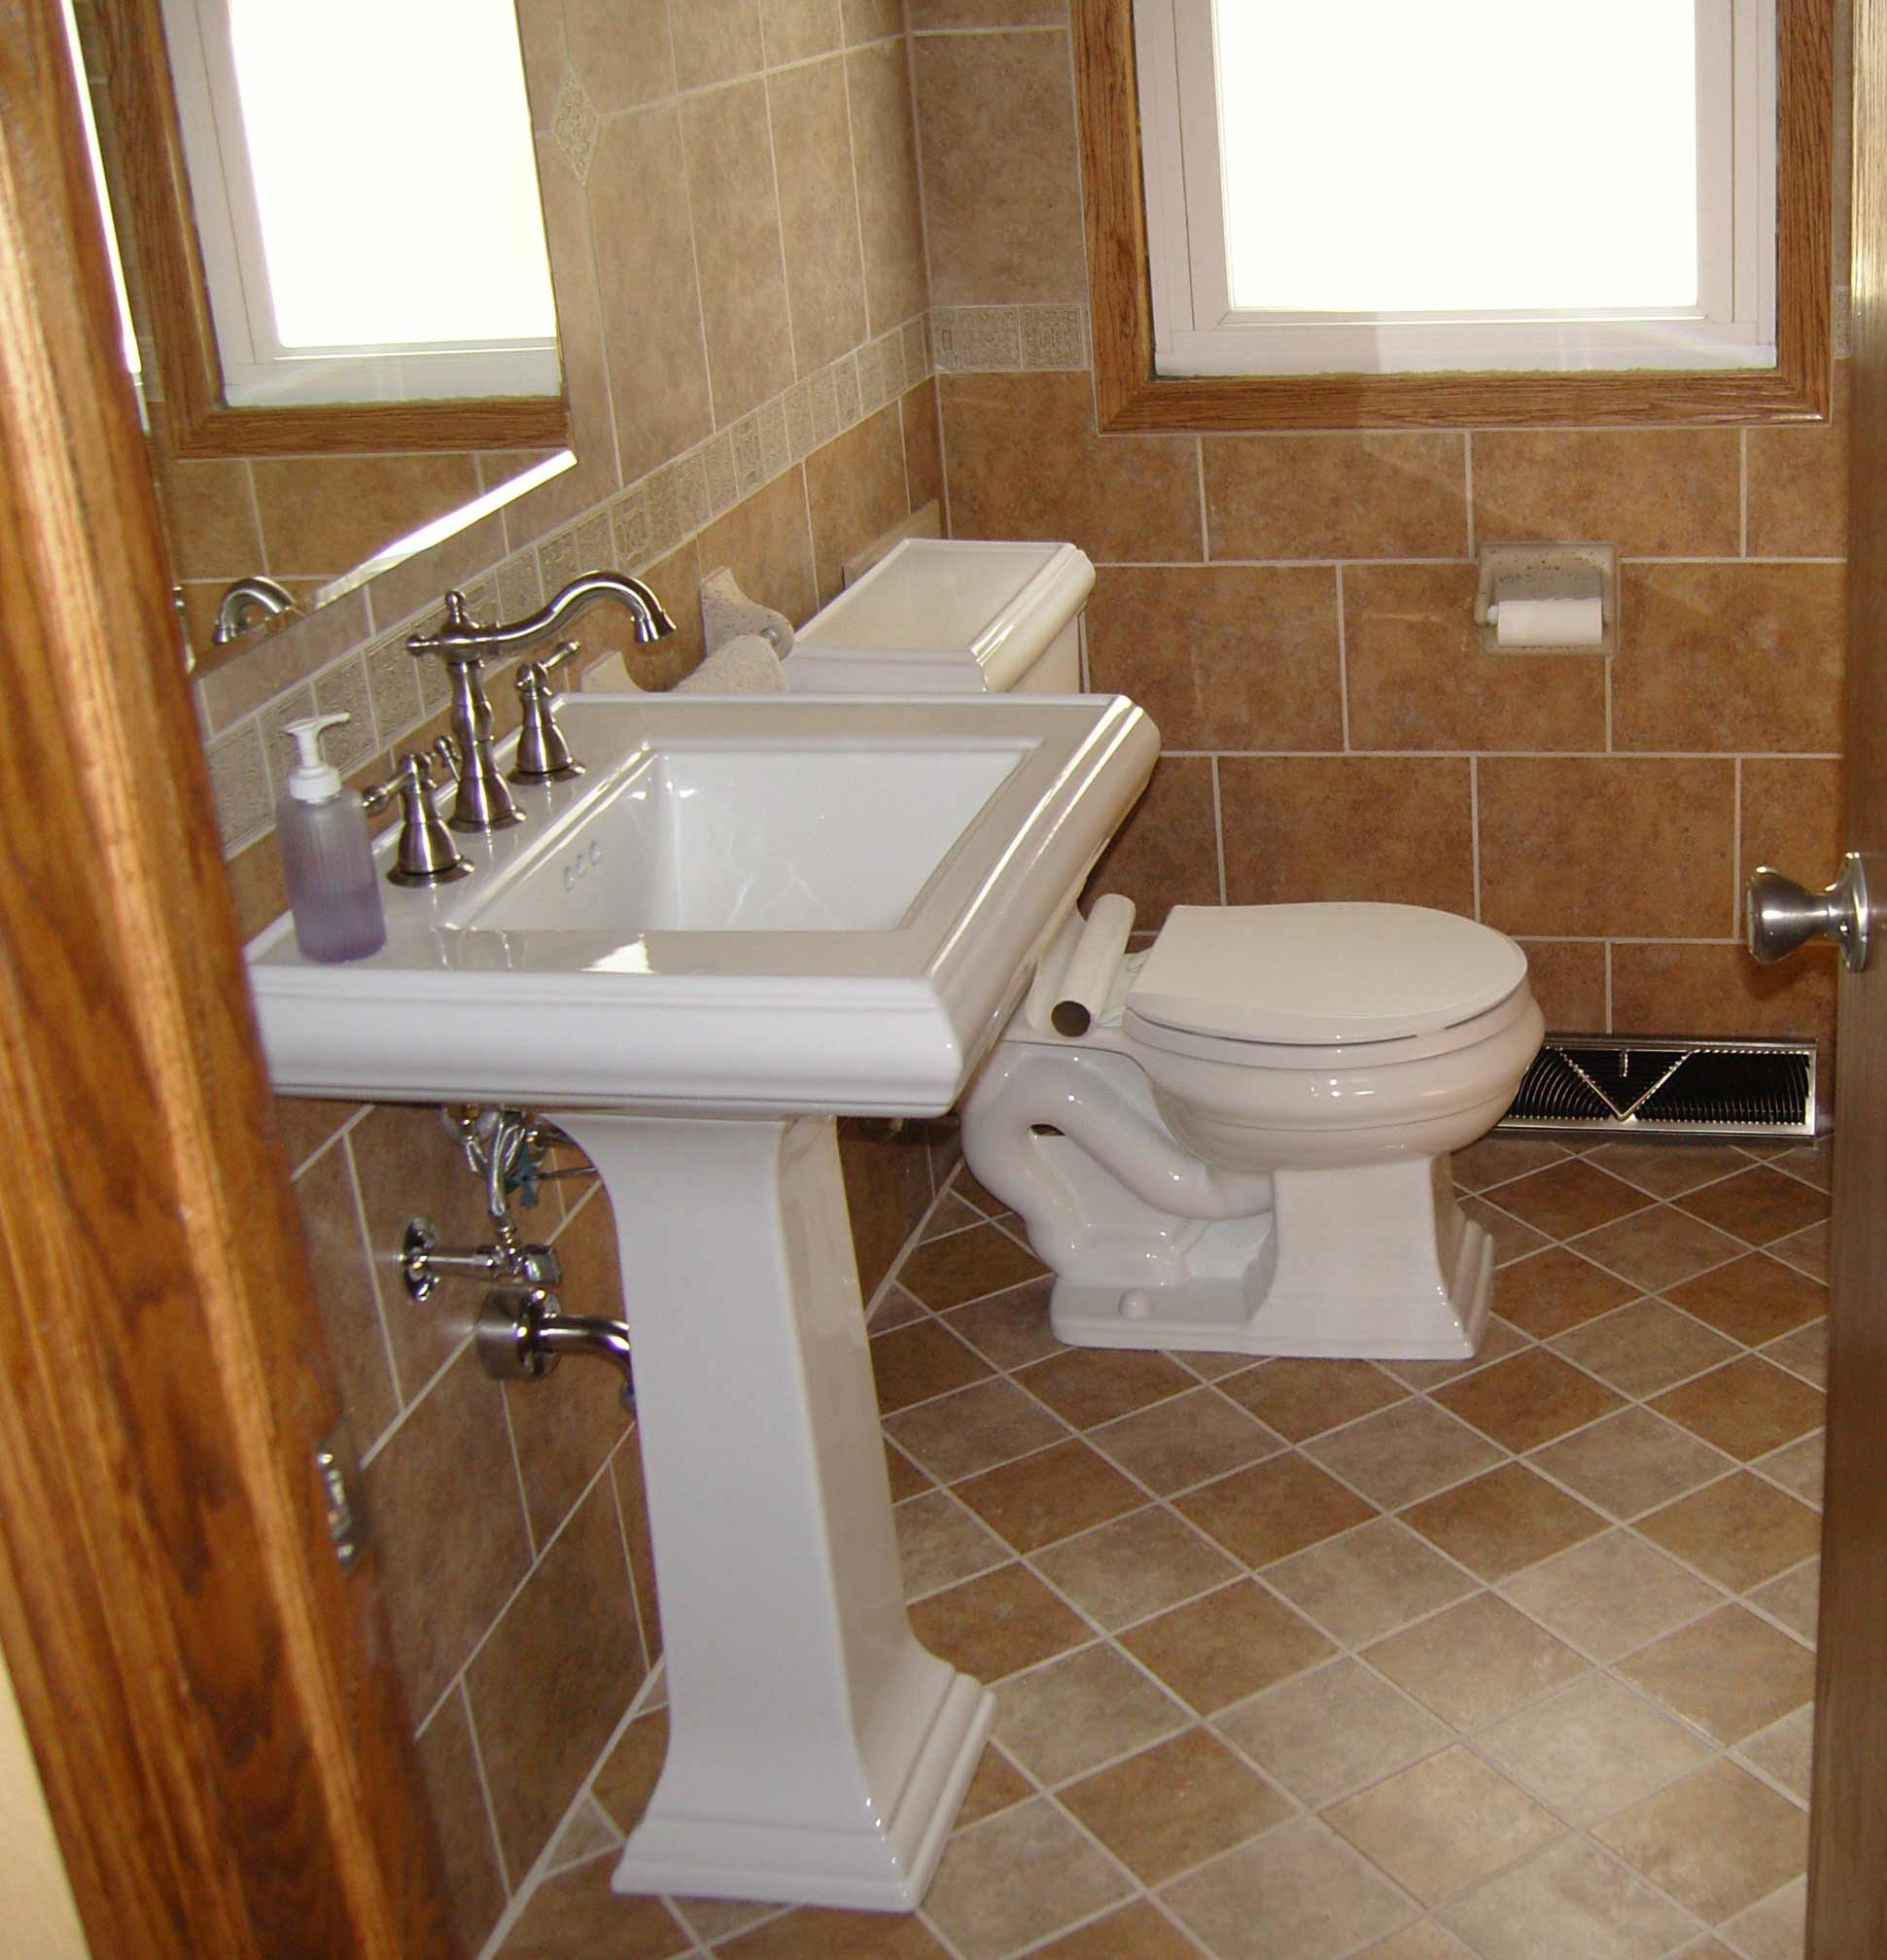 Brick floor bathroom - Carpetmartandmore Bathroom Brick Tile For Wall And Floor